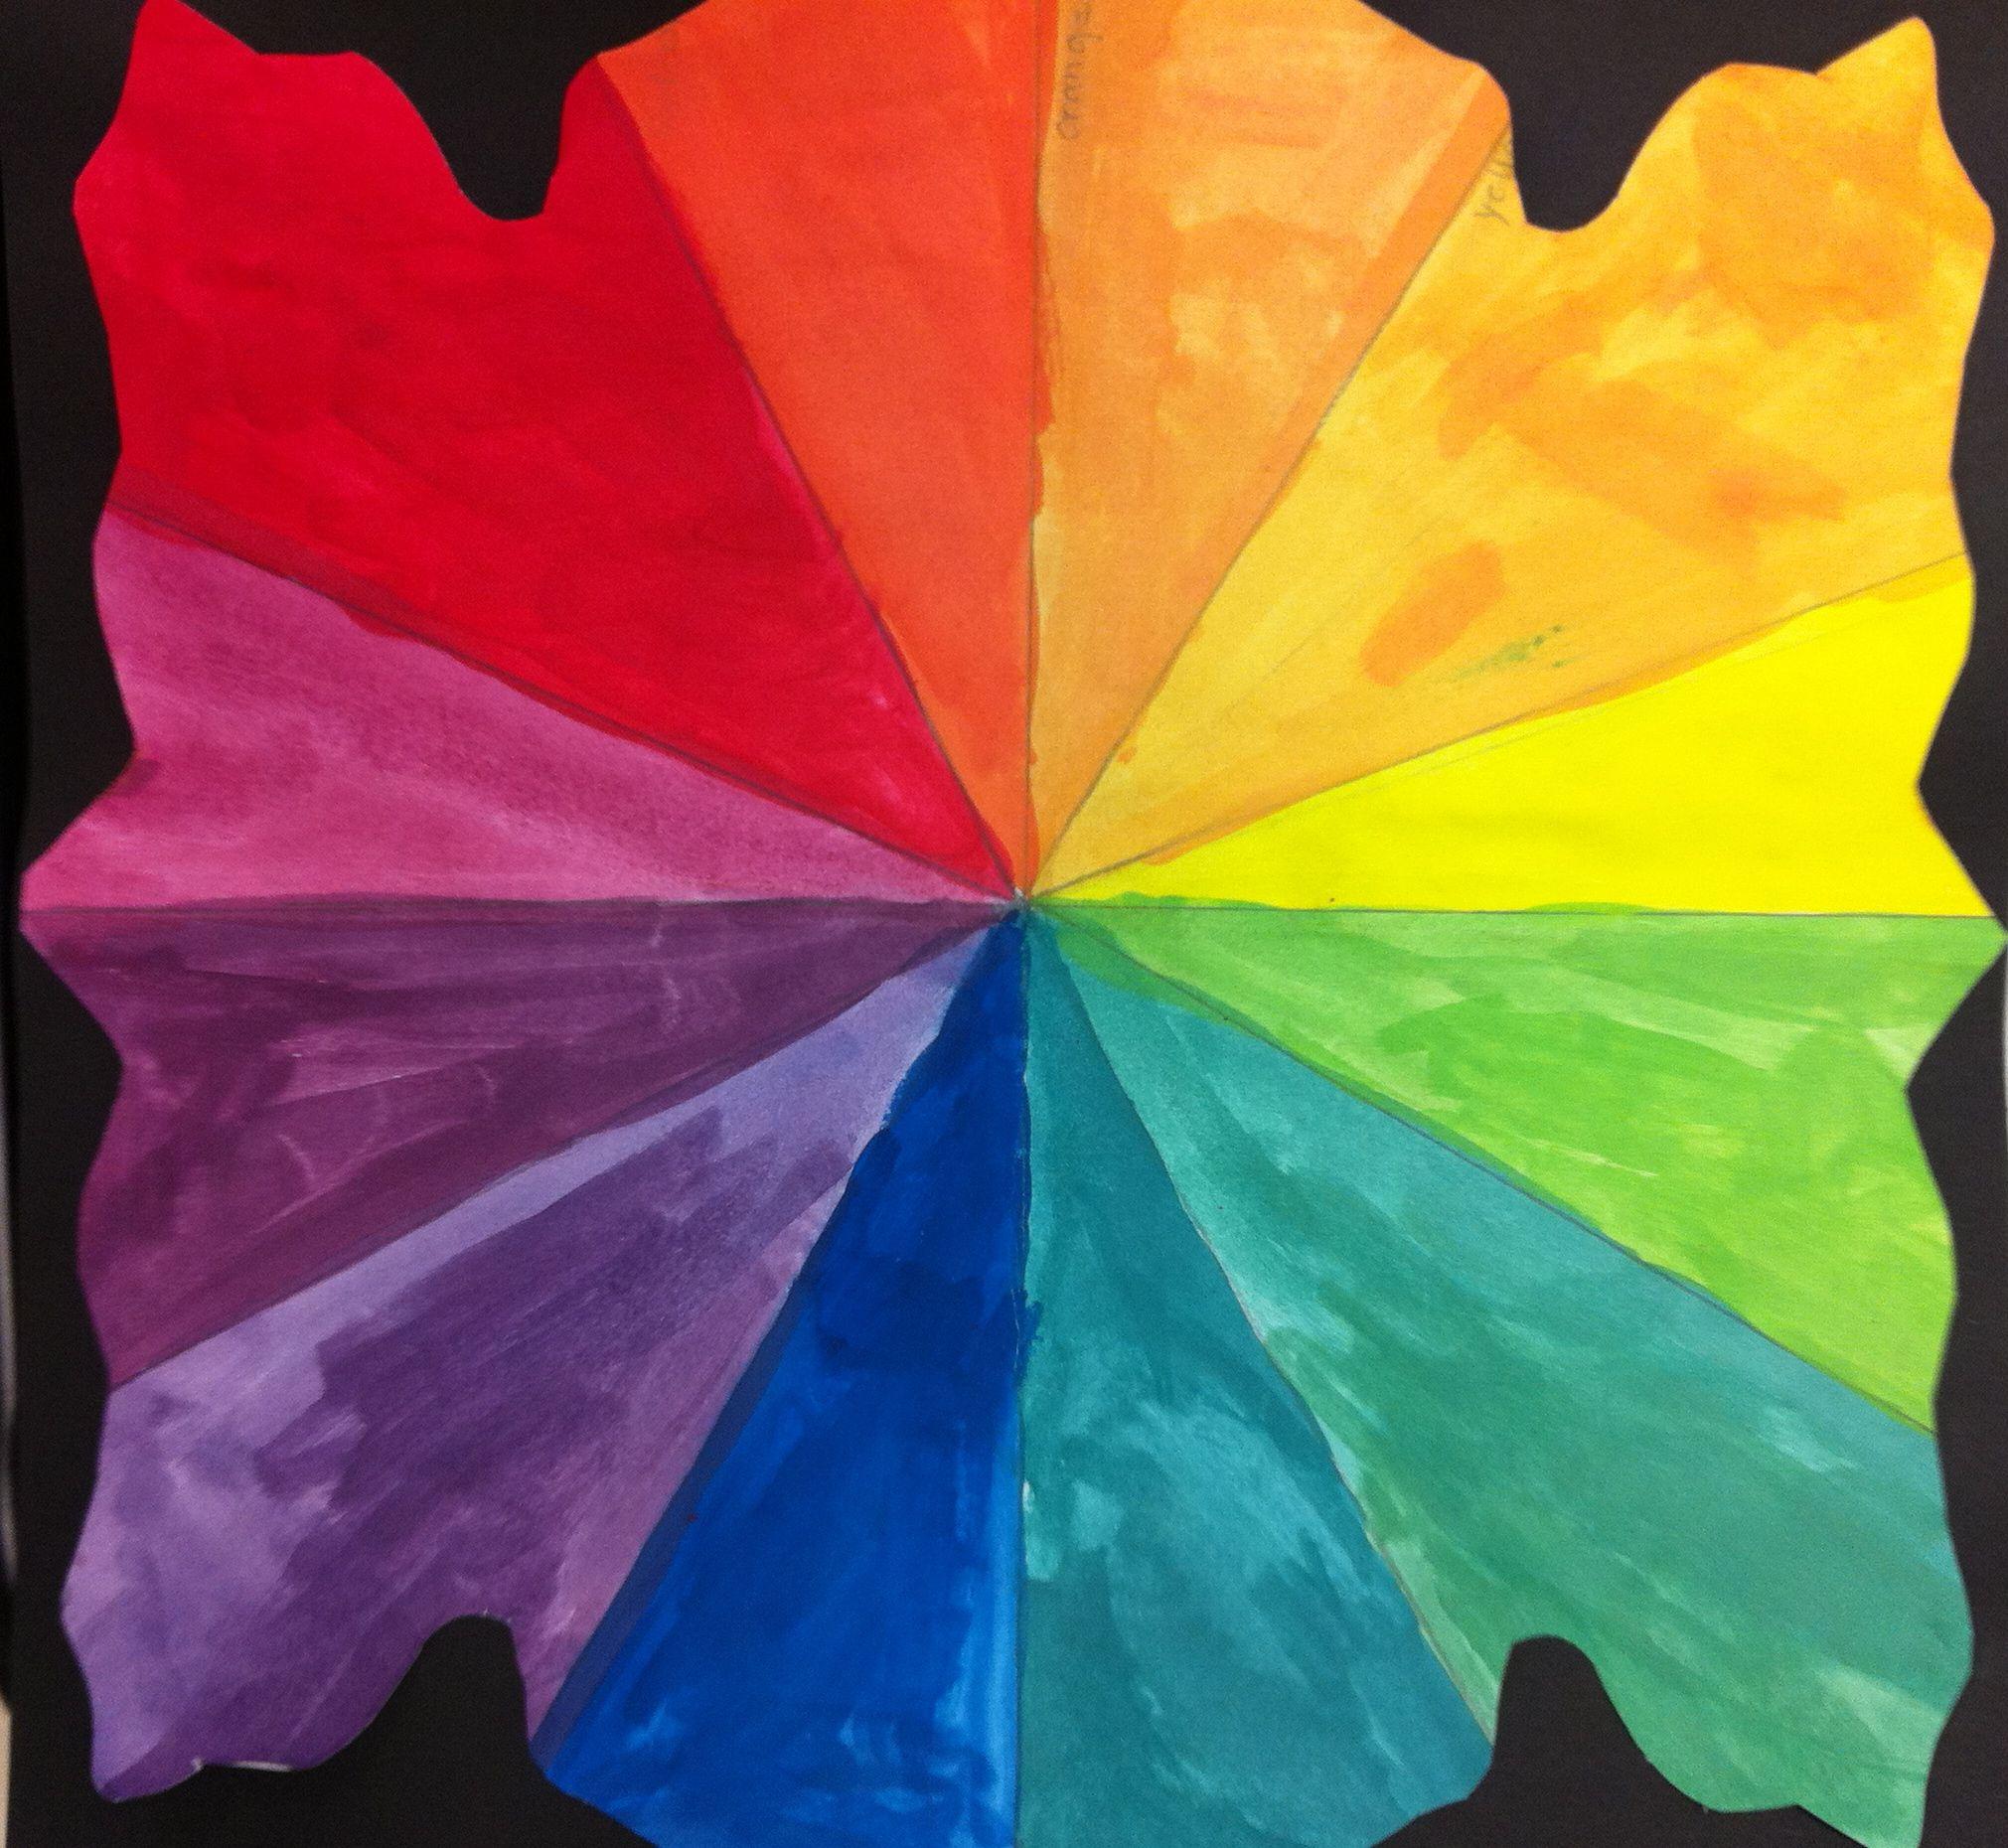 12 Hue Color Wheel Free Lesson Plan Download